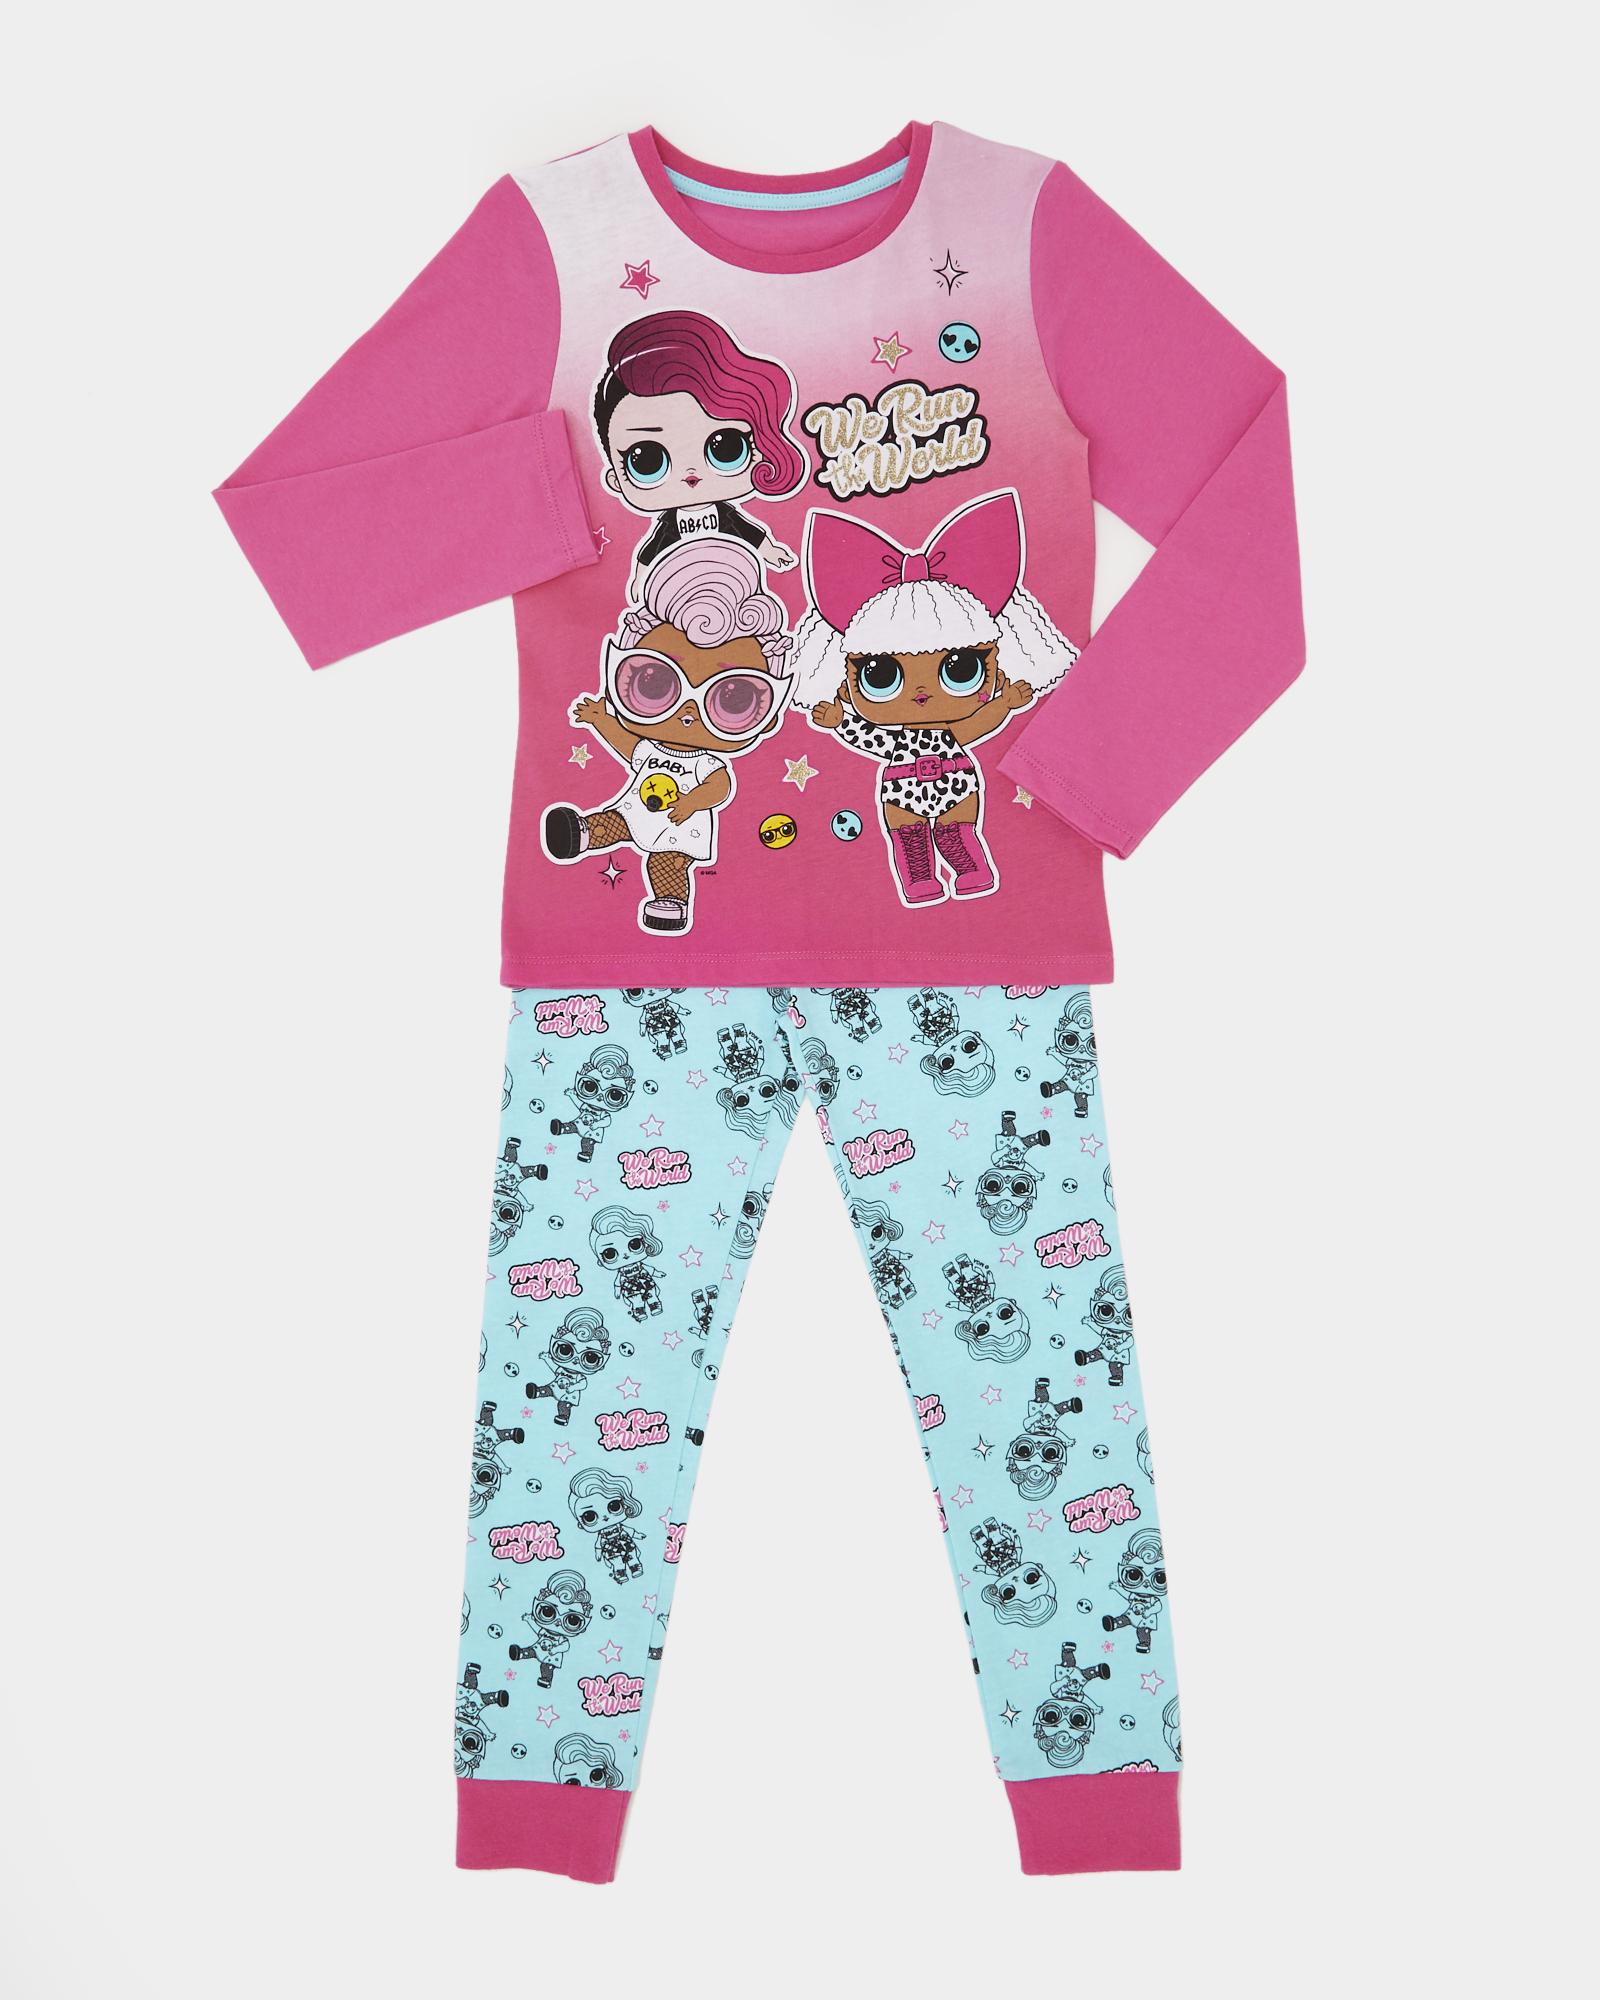 LOL Surprise Kids All in One Girls Childrens Sleepsuit Pyjamas We Run The World